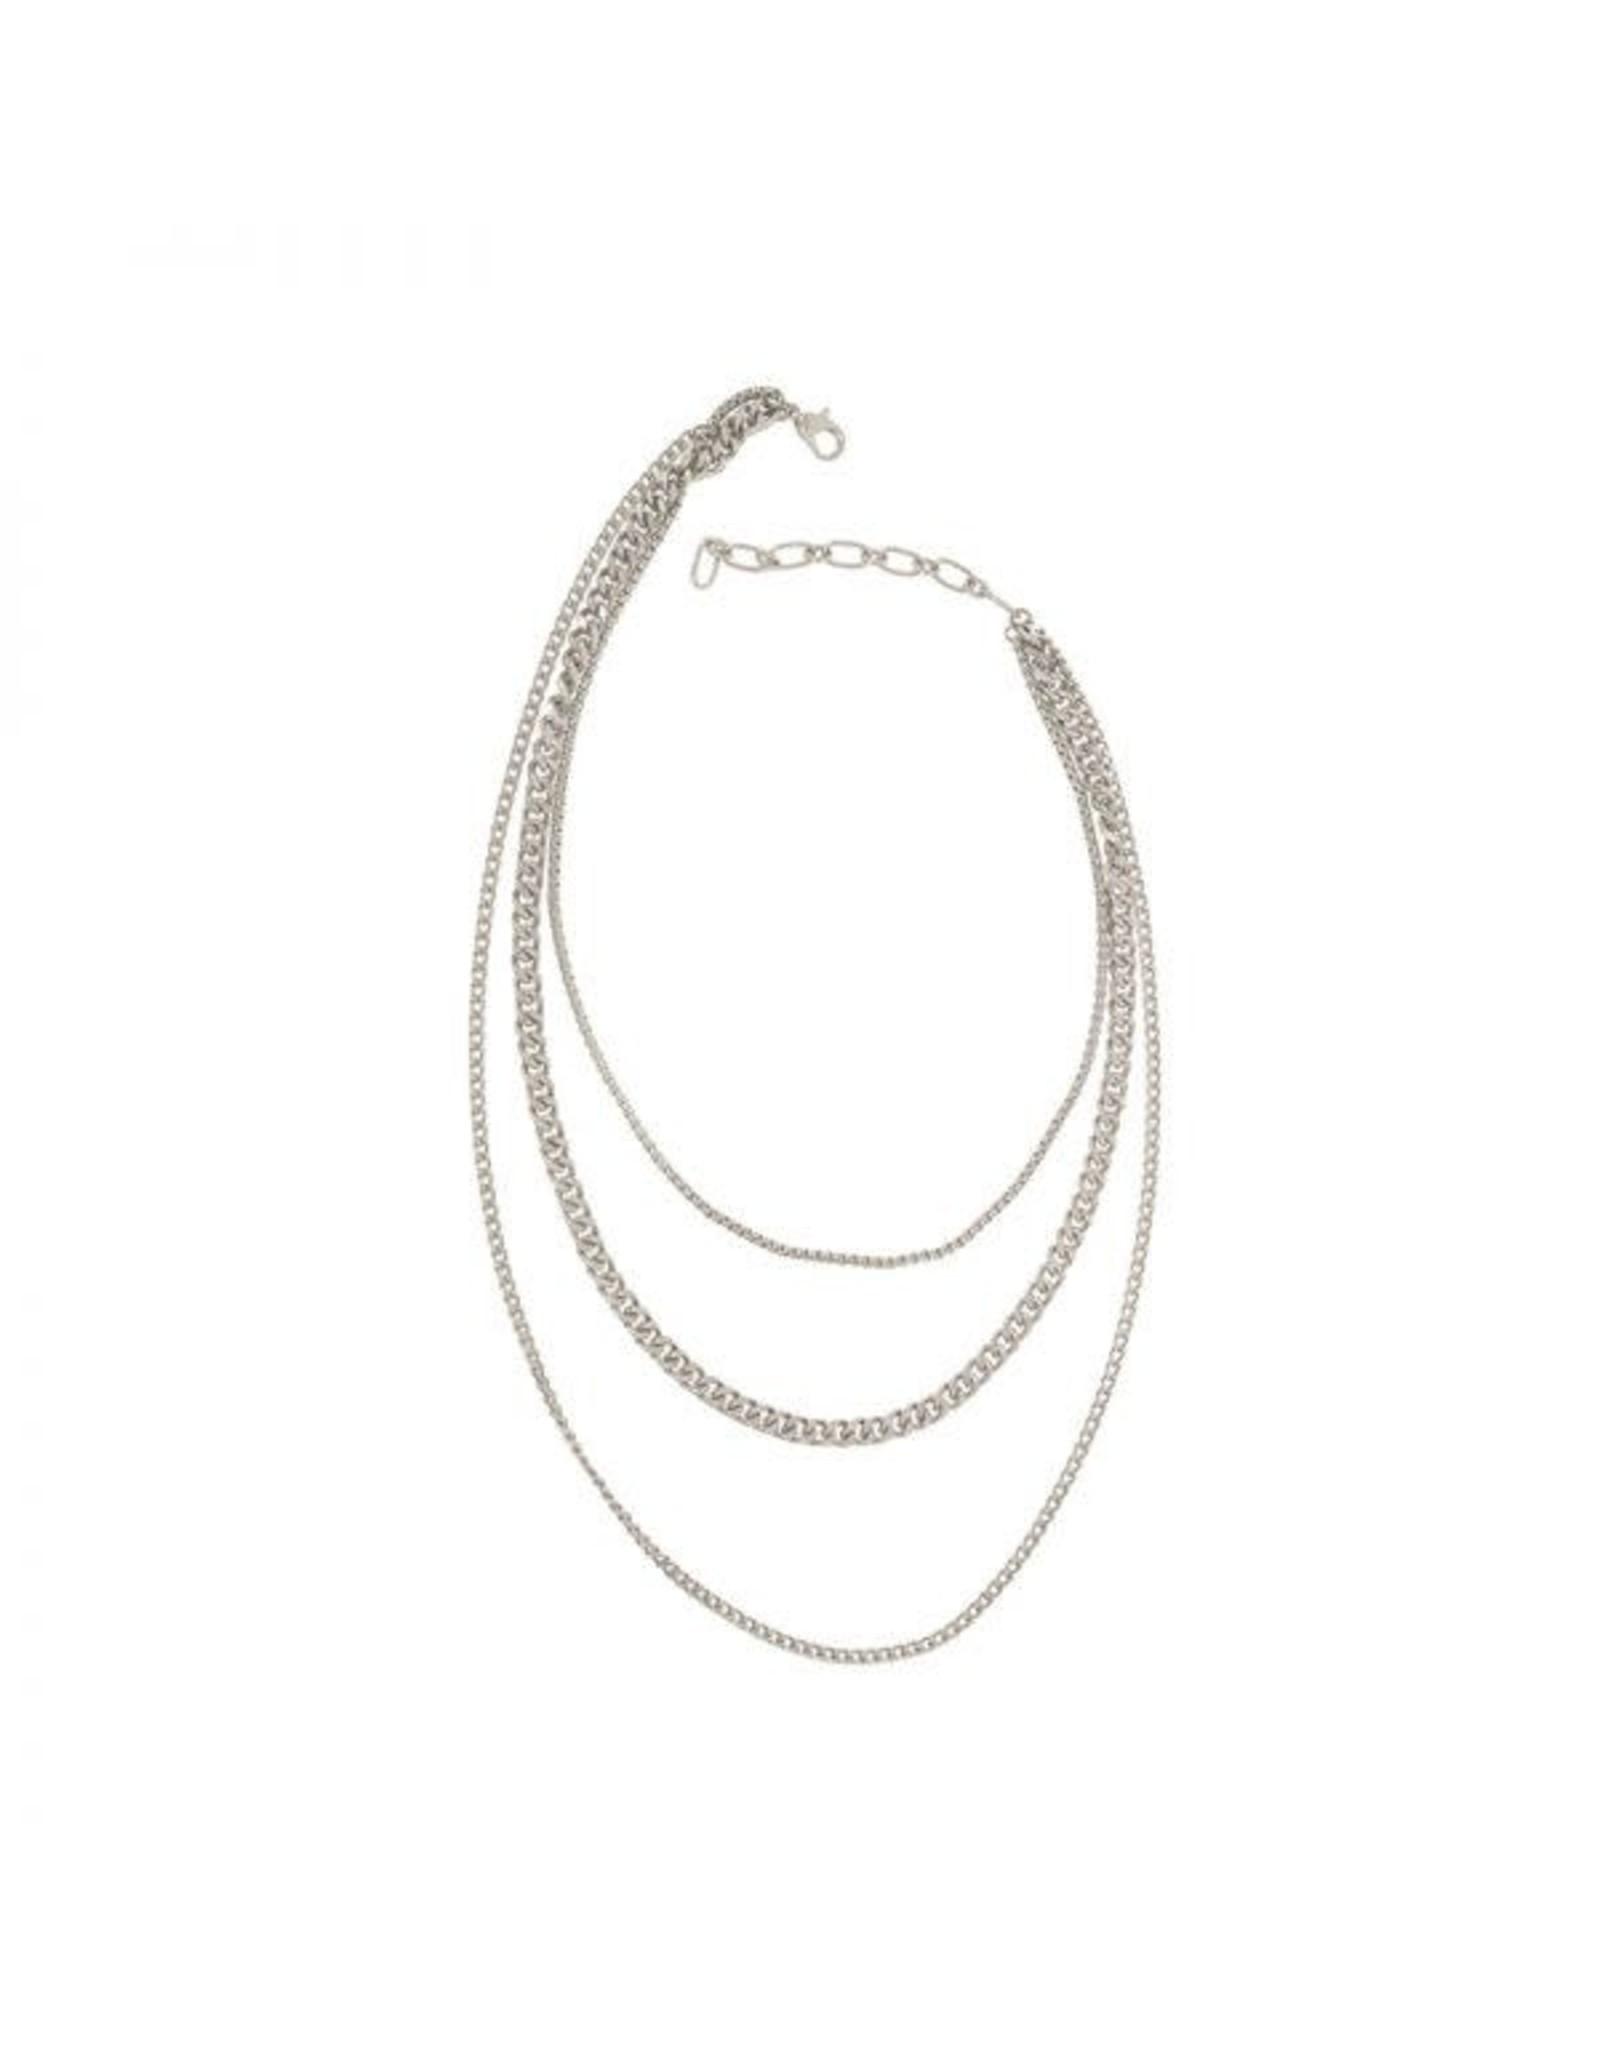 Joy Susan Three Row Layered Chain Necklace